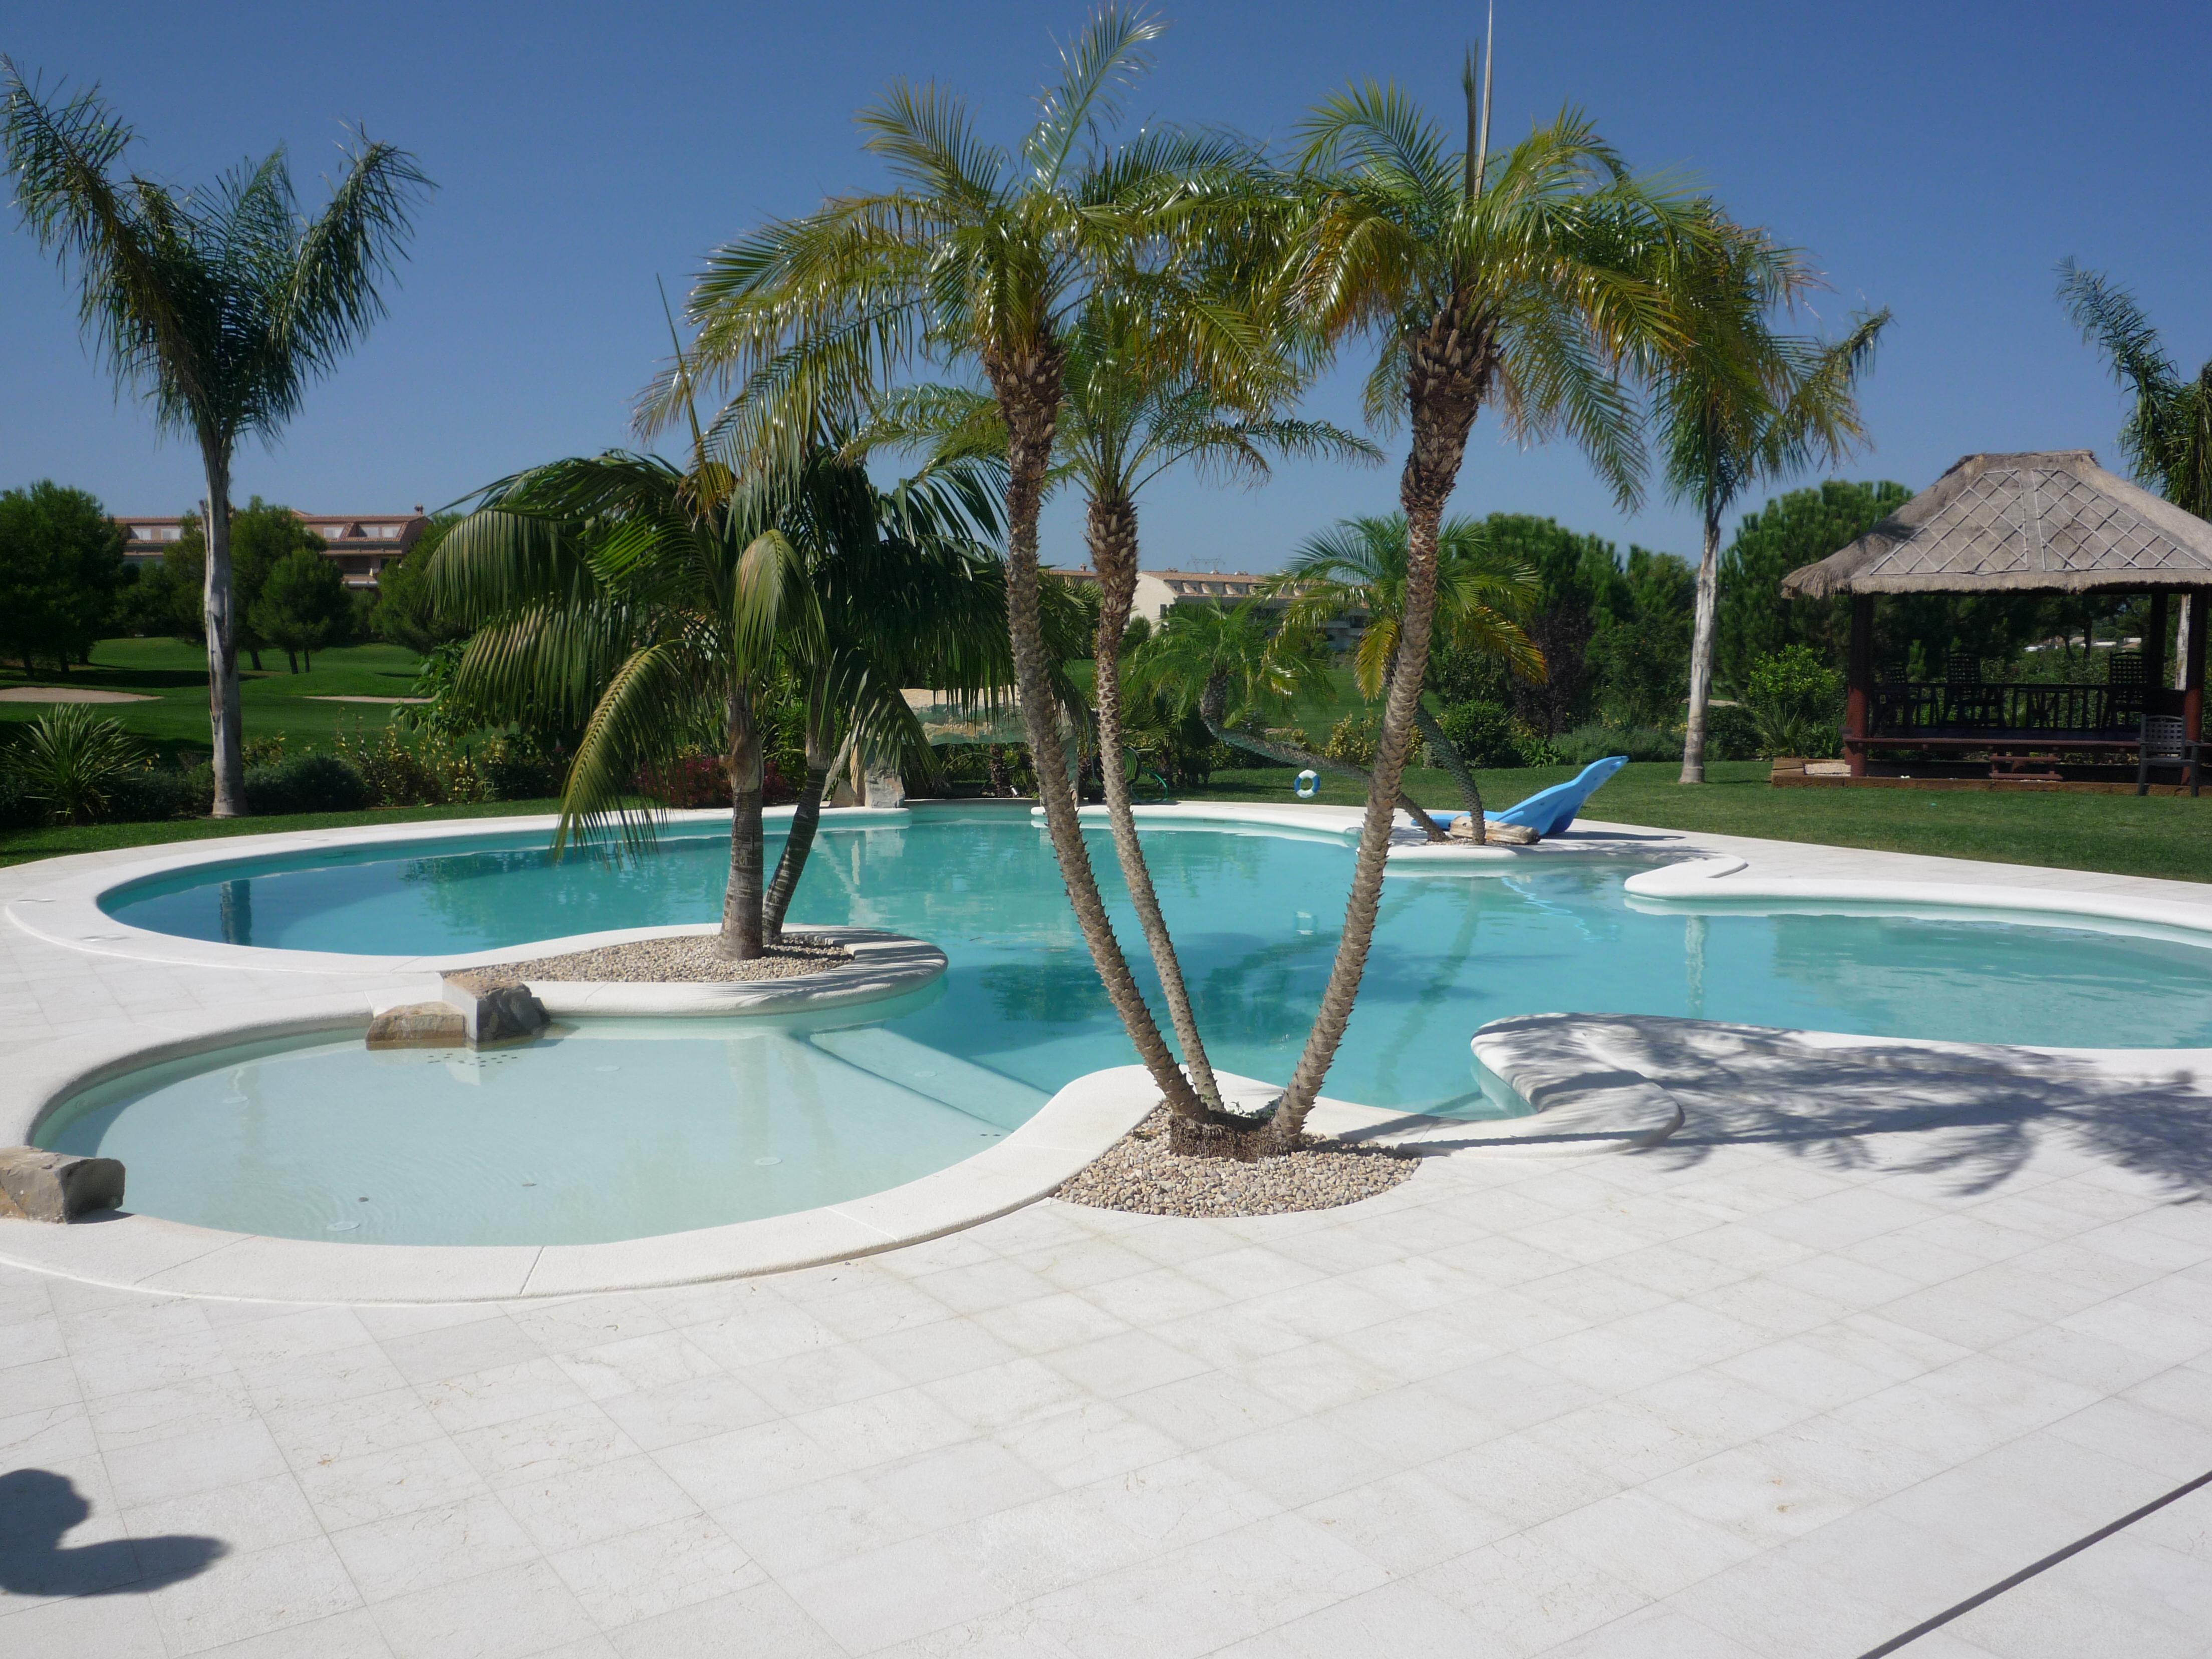 Mantenimiento de piscinas servicio tecnico piscinas valencia for Piscina valencia